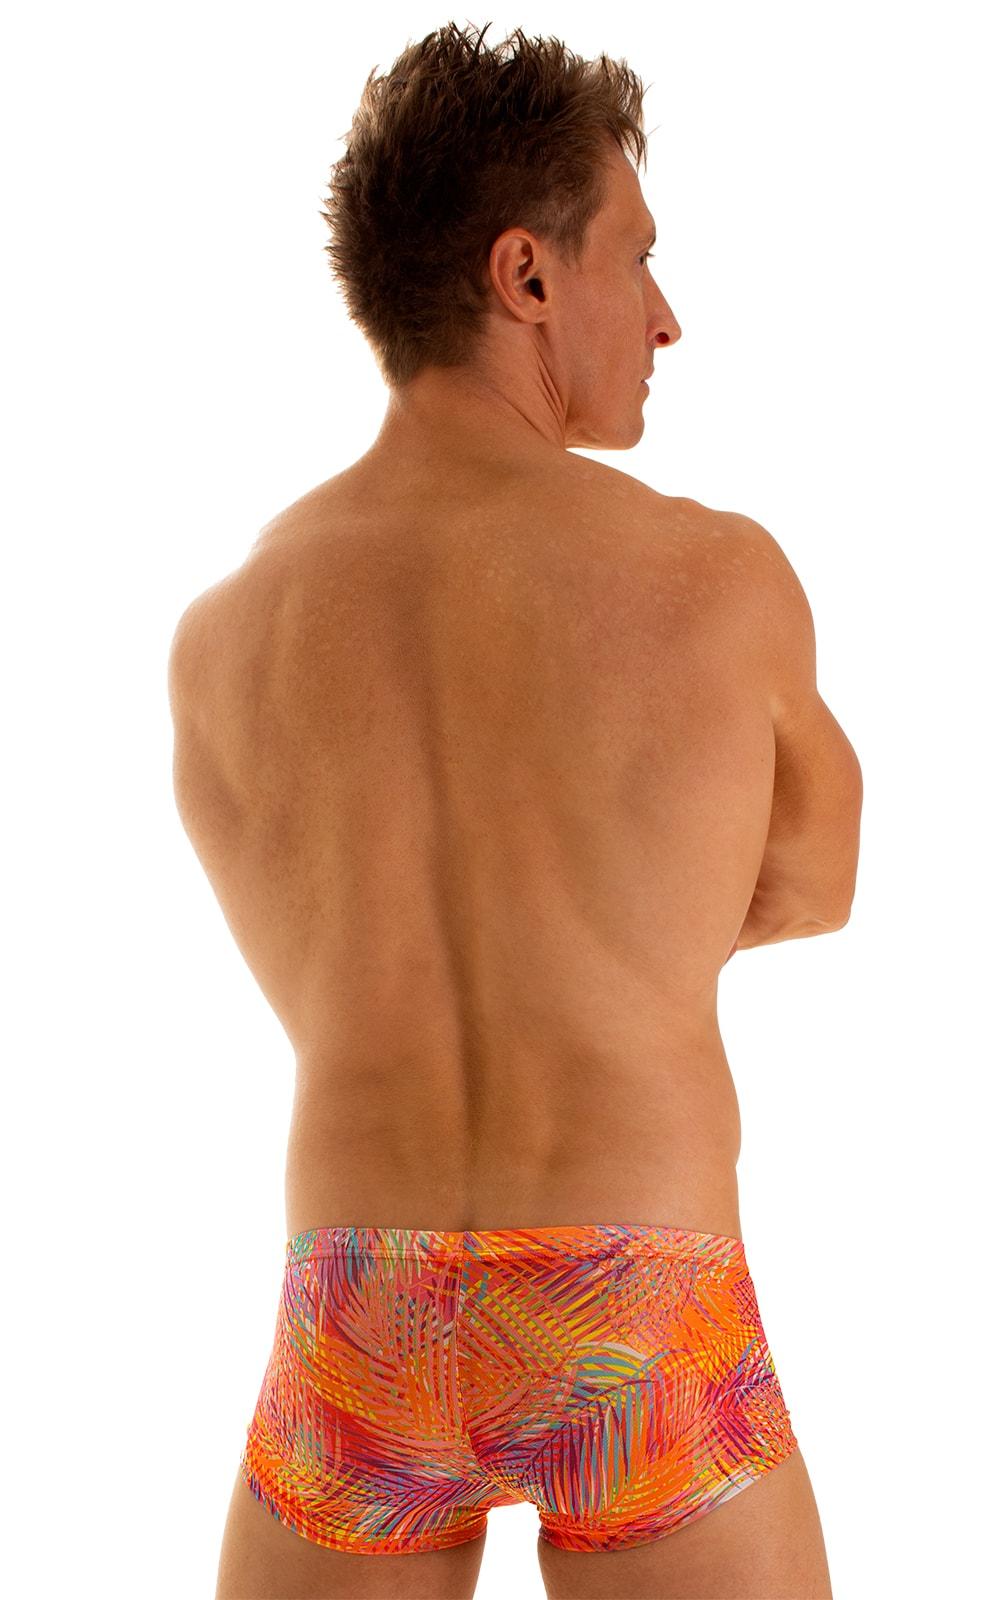 Extreme Low Square Cut Swim Trunks in Tan Through Orange Jungle 2